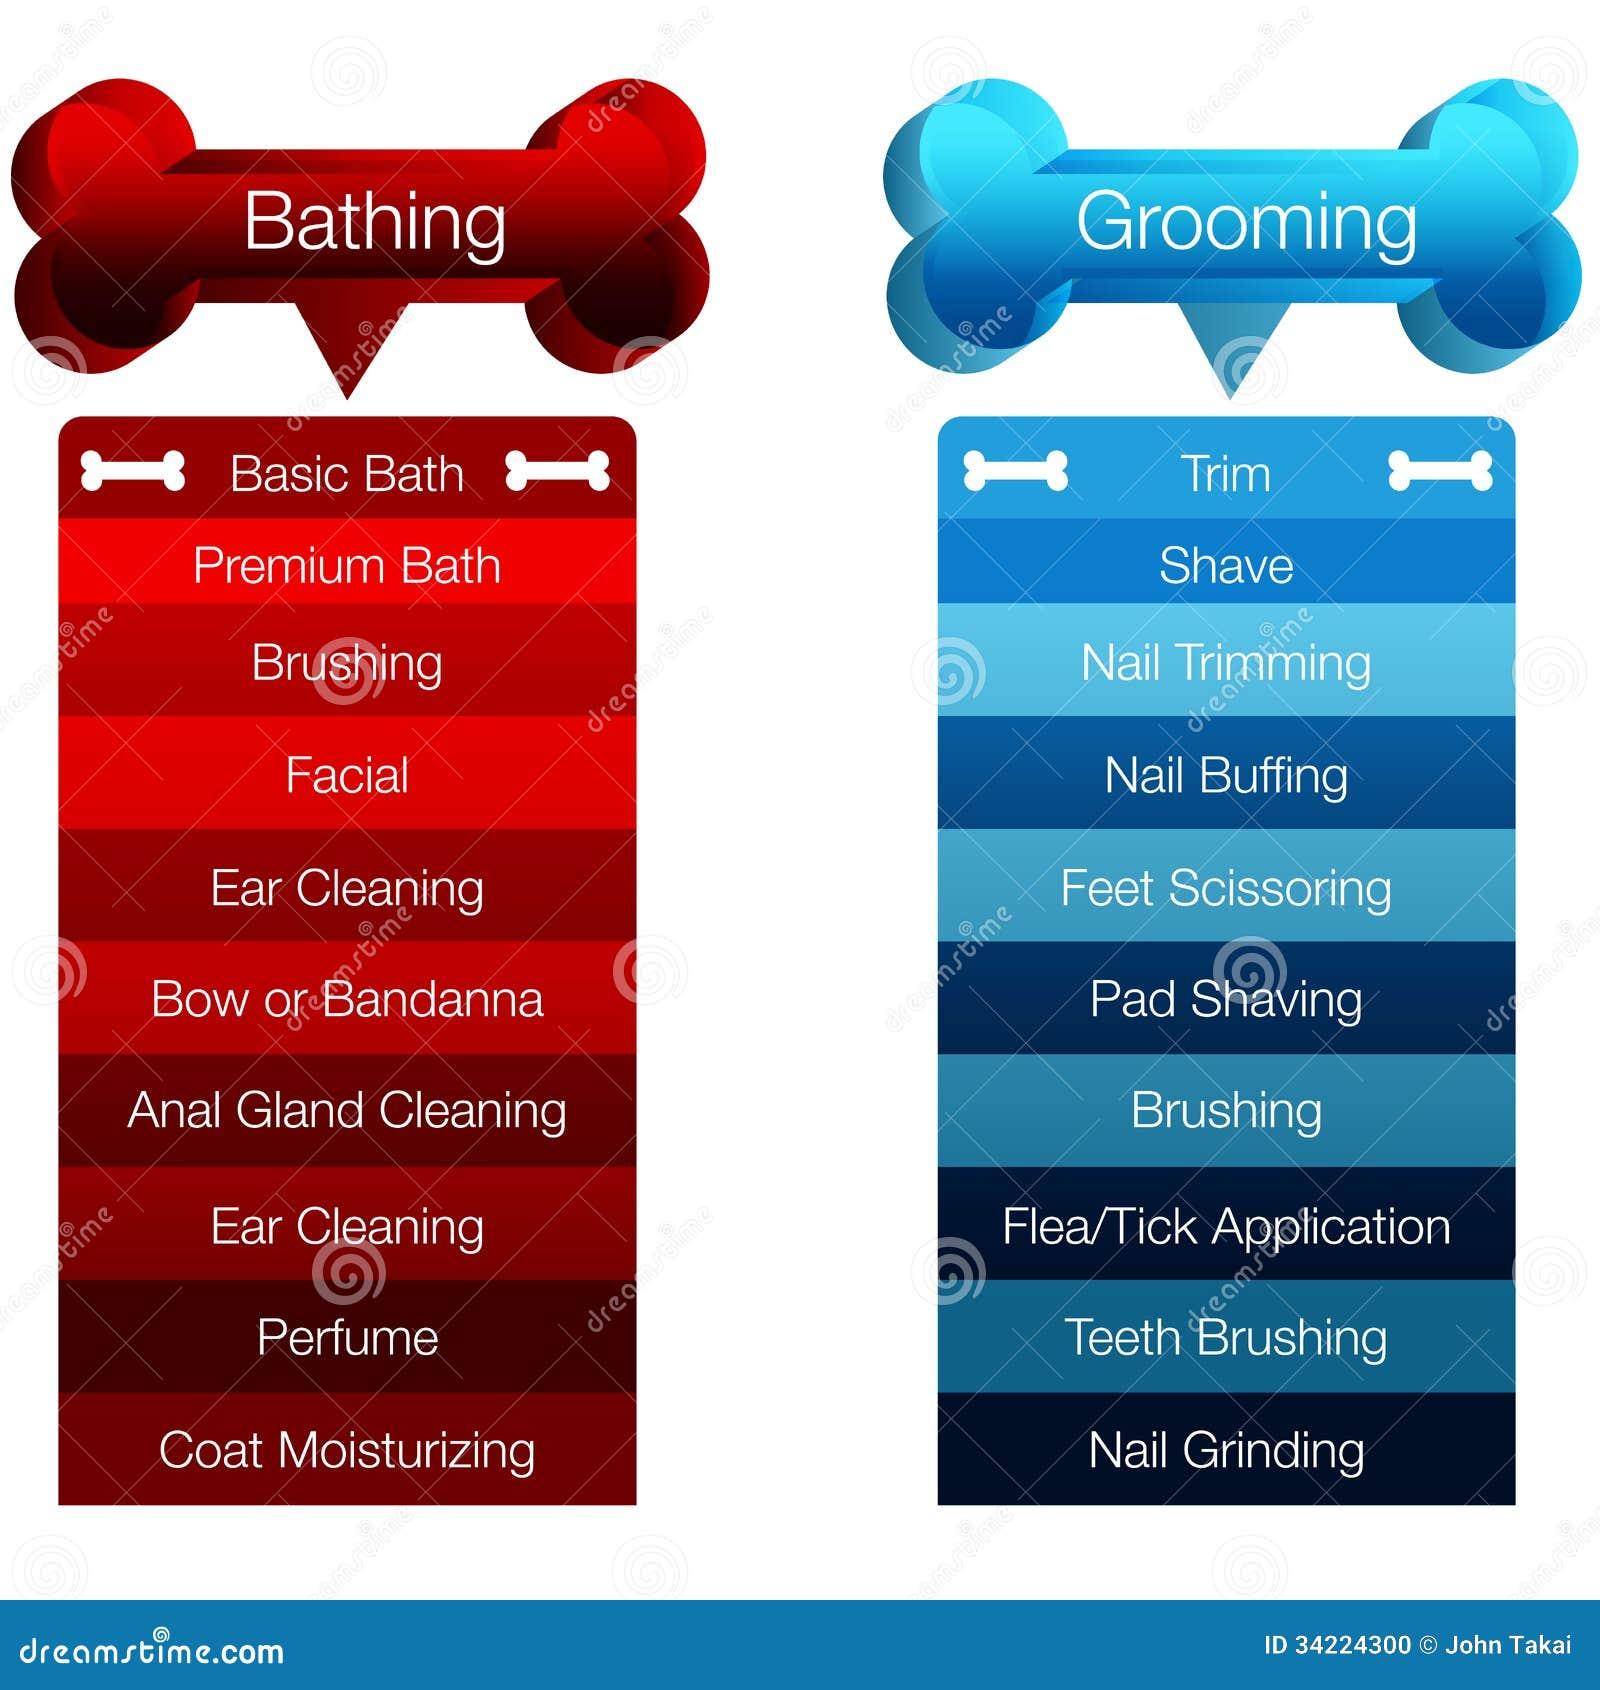 pet grooming business plan download